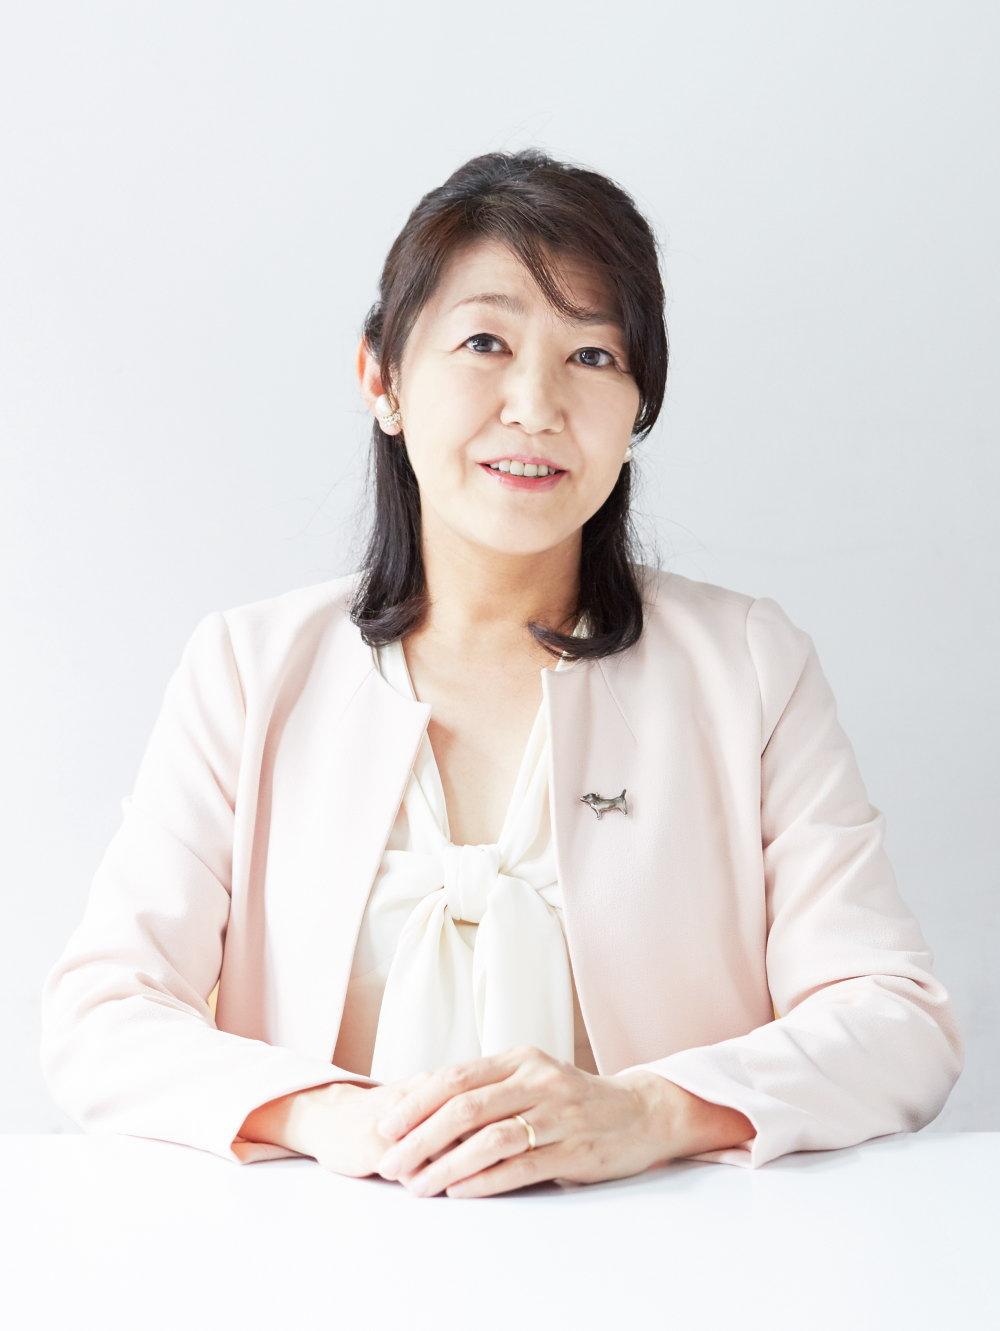 HER-SELF 女性の健康プロジェクト 代表理事  白河 桃子 氏